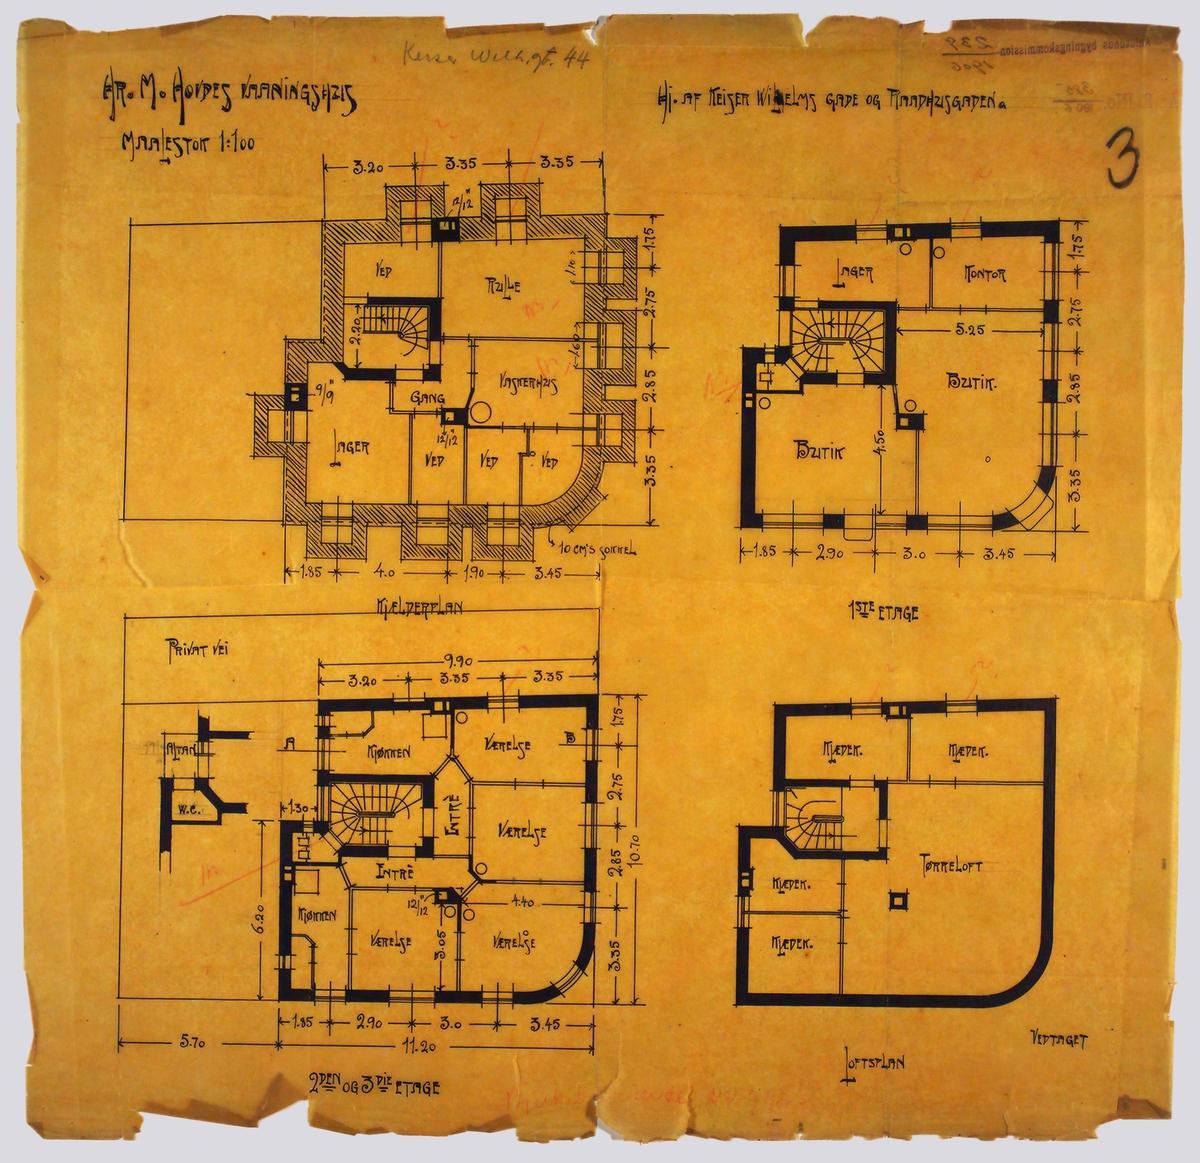 Hr. M. Hovdes vaaningshus [Arbeidstegning]